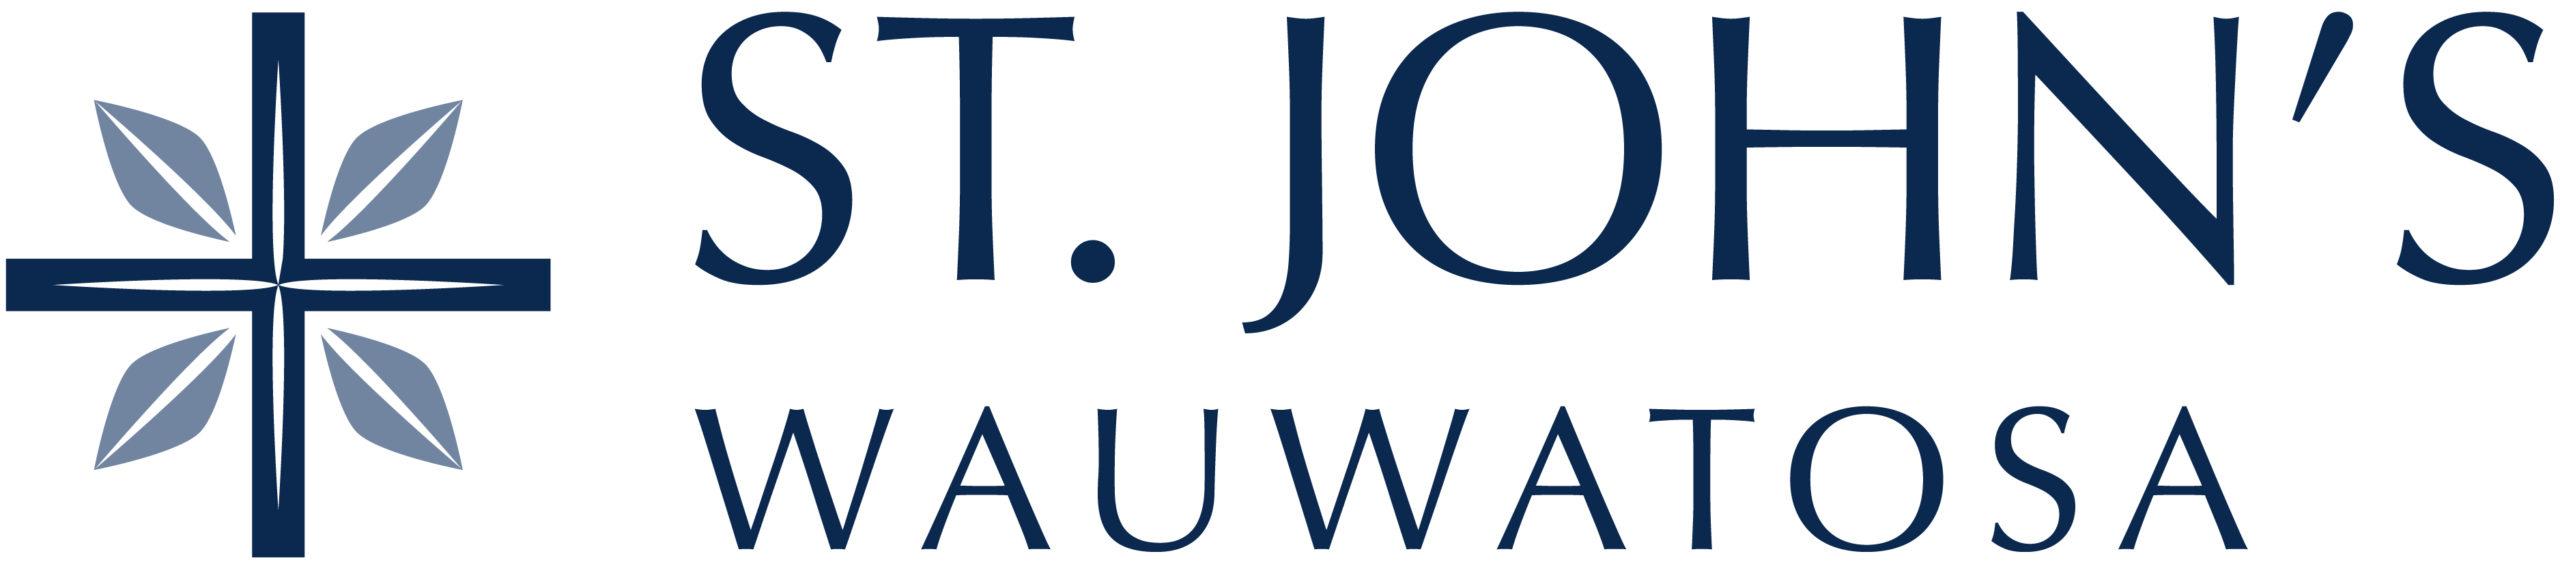 logo-wauwatosa-horizontal-large-color